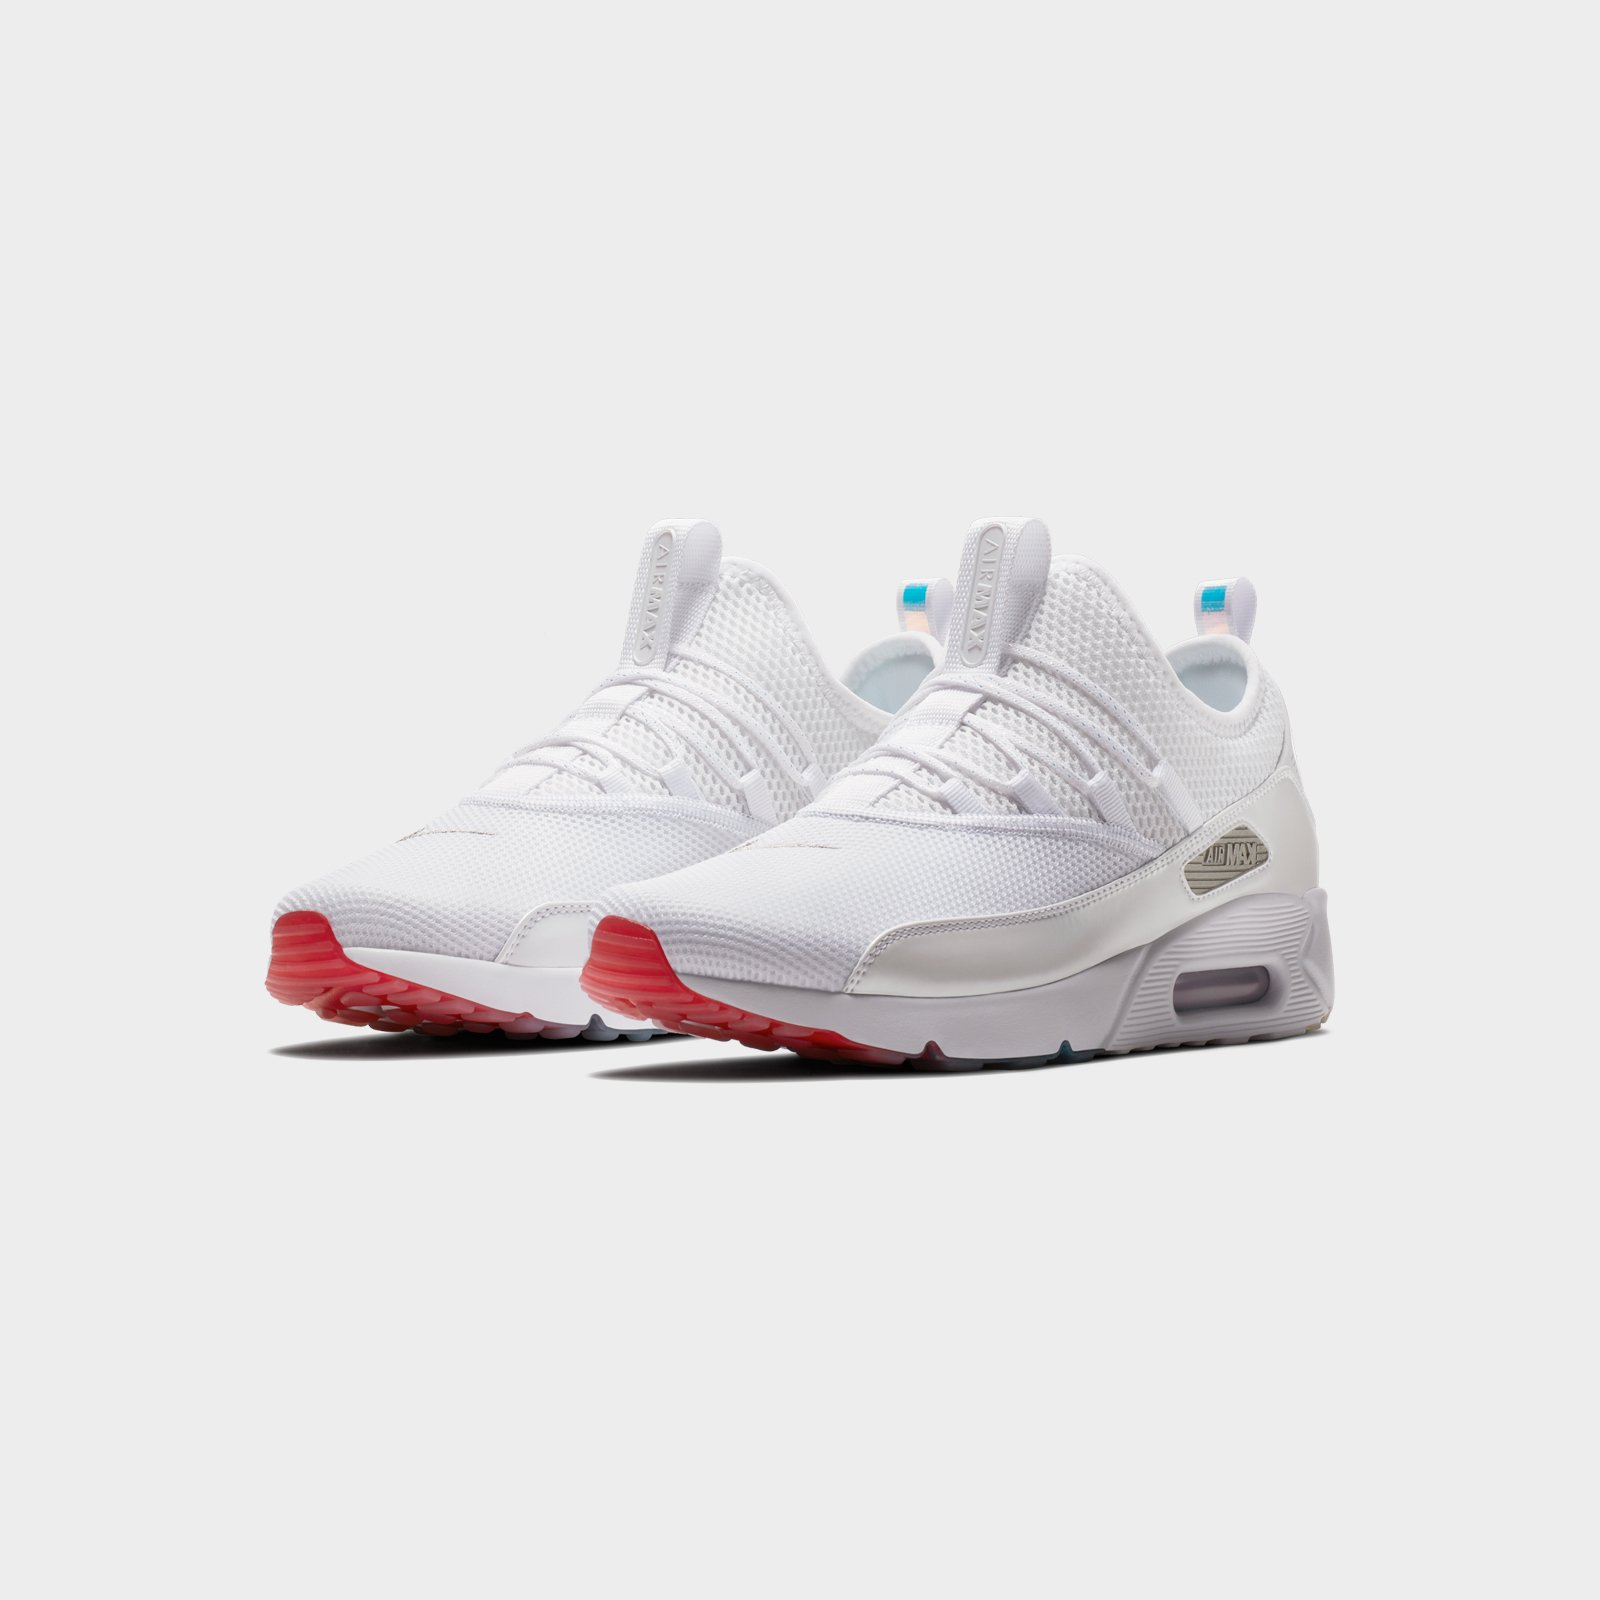 new product 9af88 968d2 Nike Air Max 90 EZ - Aq7980-100 - Sneakersnstuff   sneakers   streetwear  online since 1999